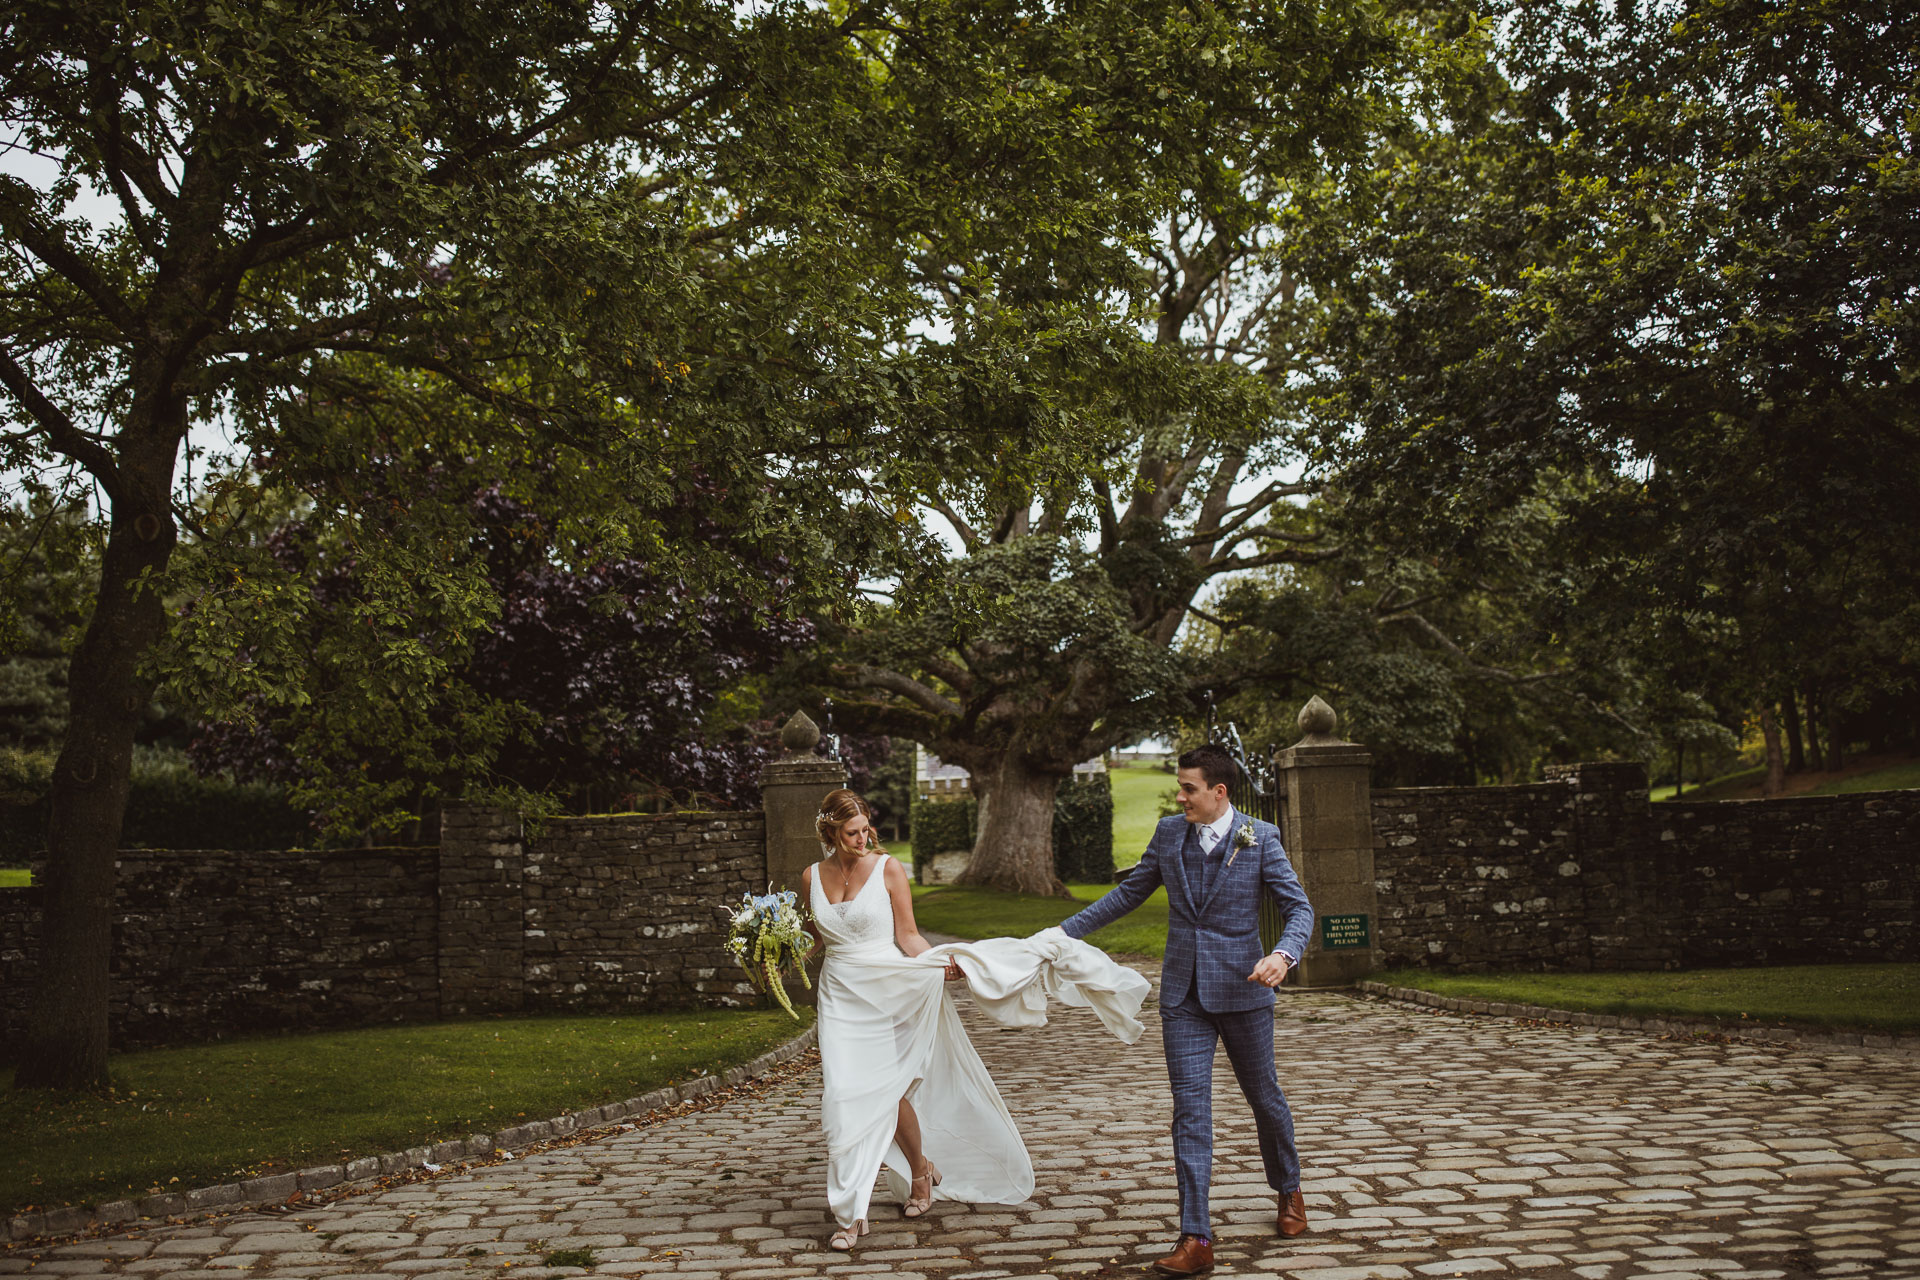 forbidden_corner_tupgill_estate_wedding_photographer-106.jpg